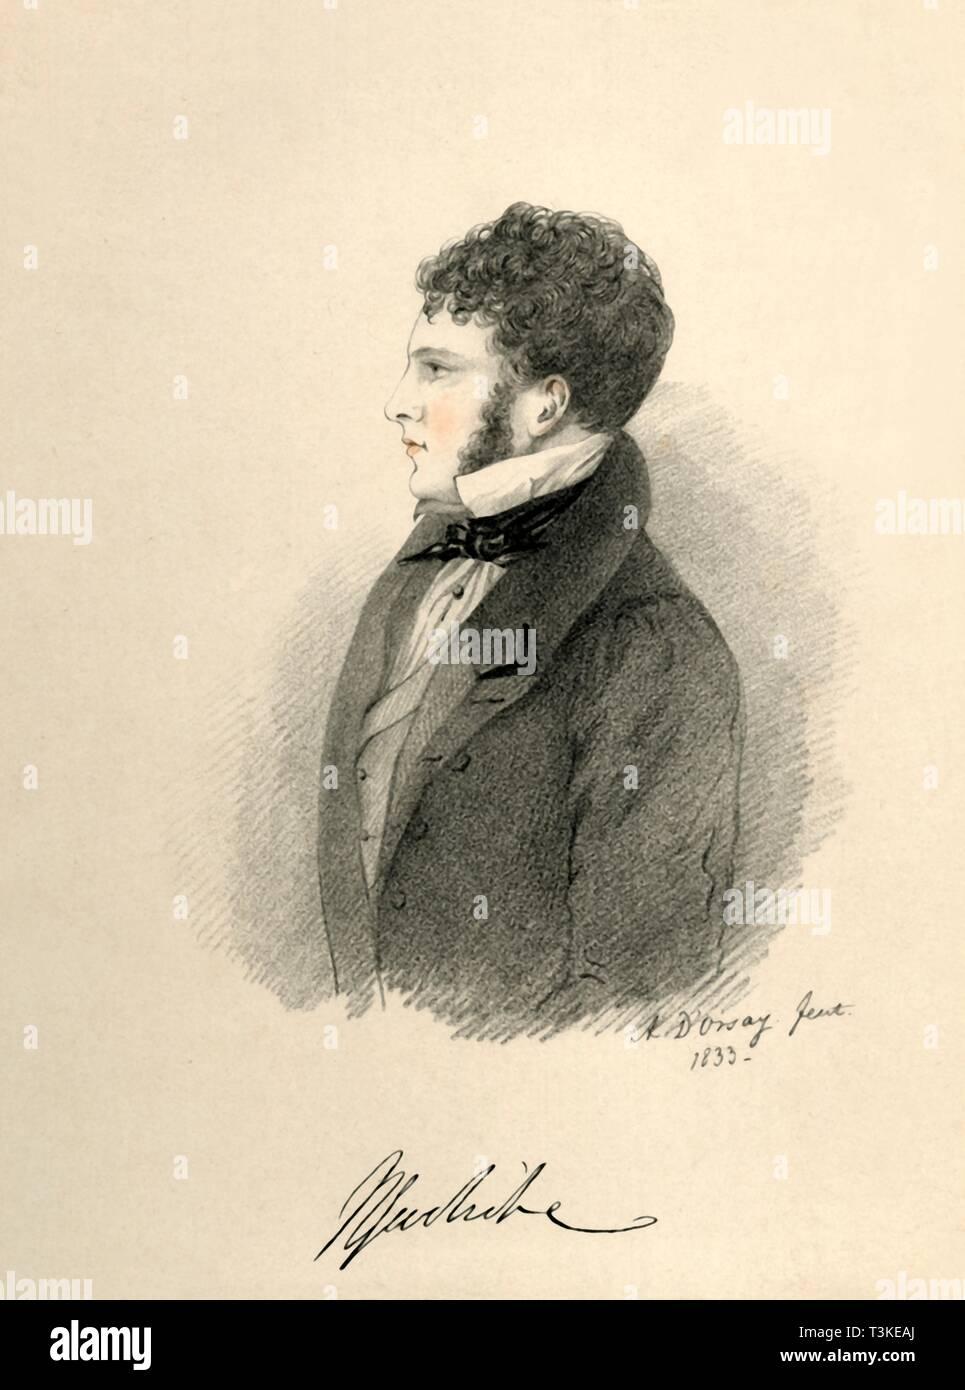 'Sir Harry Goodricke', 1833. Creator: Richard James Lane. - Stock Image